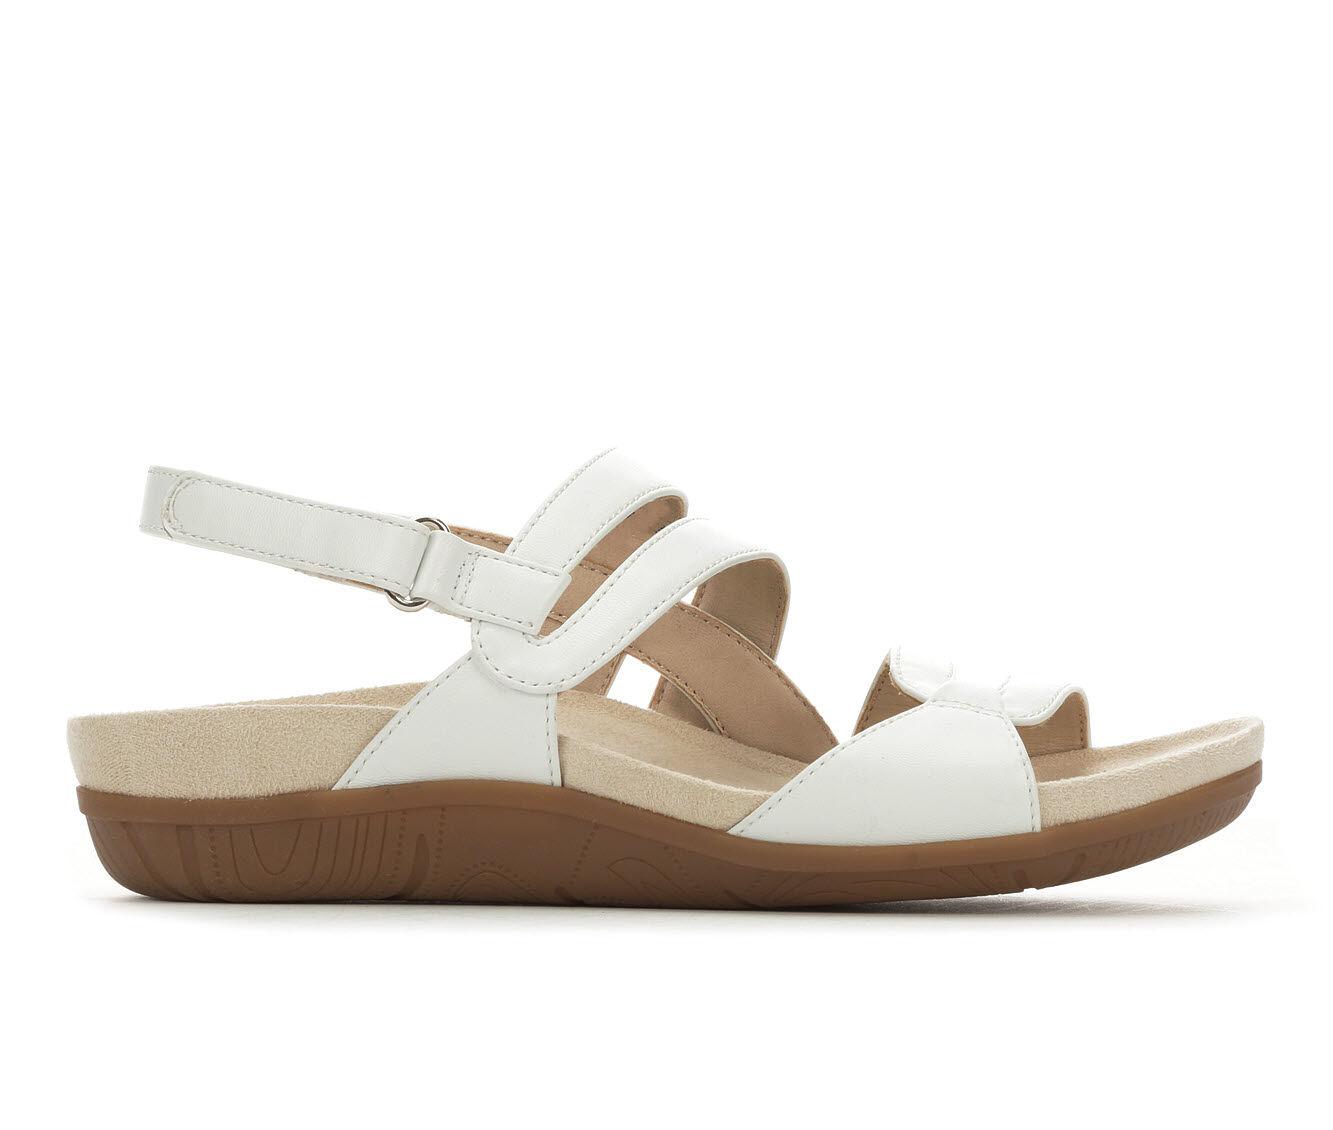 lowest price Women's Baretraps Jenifer Sandals White